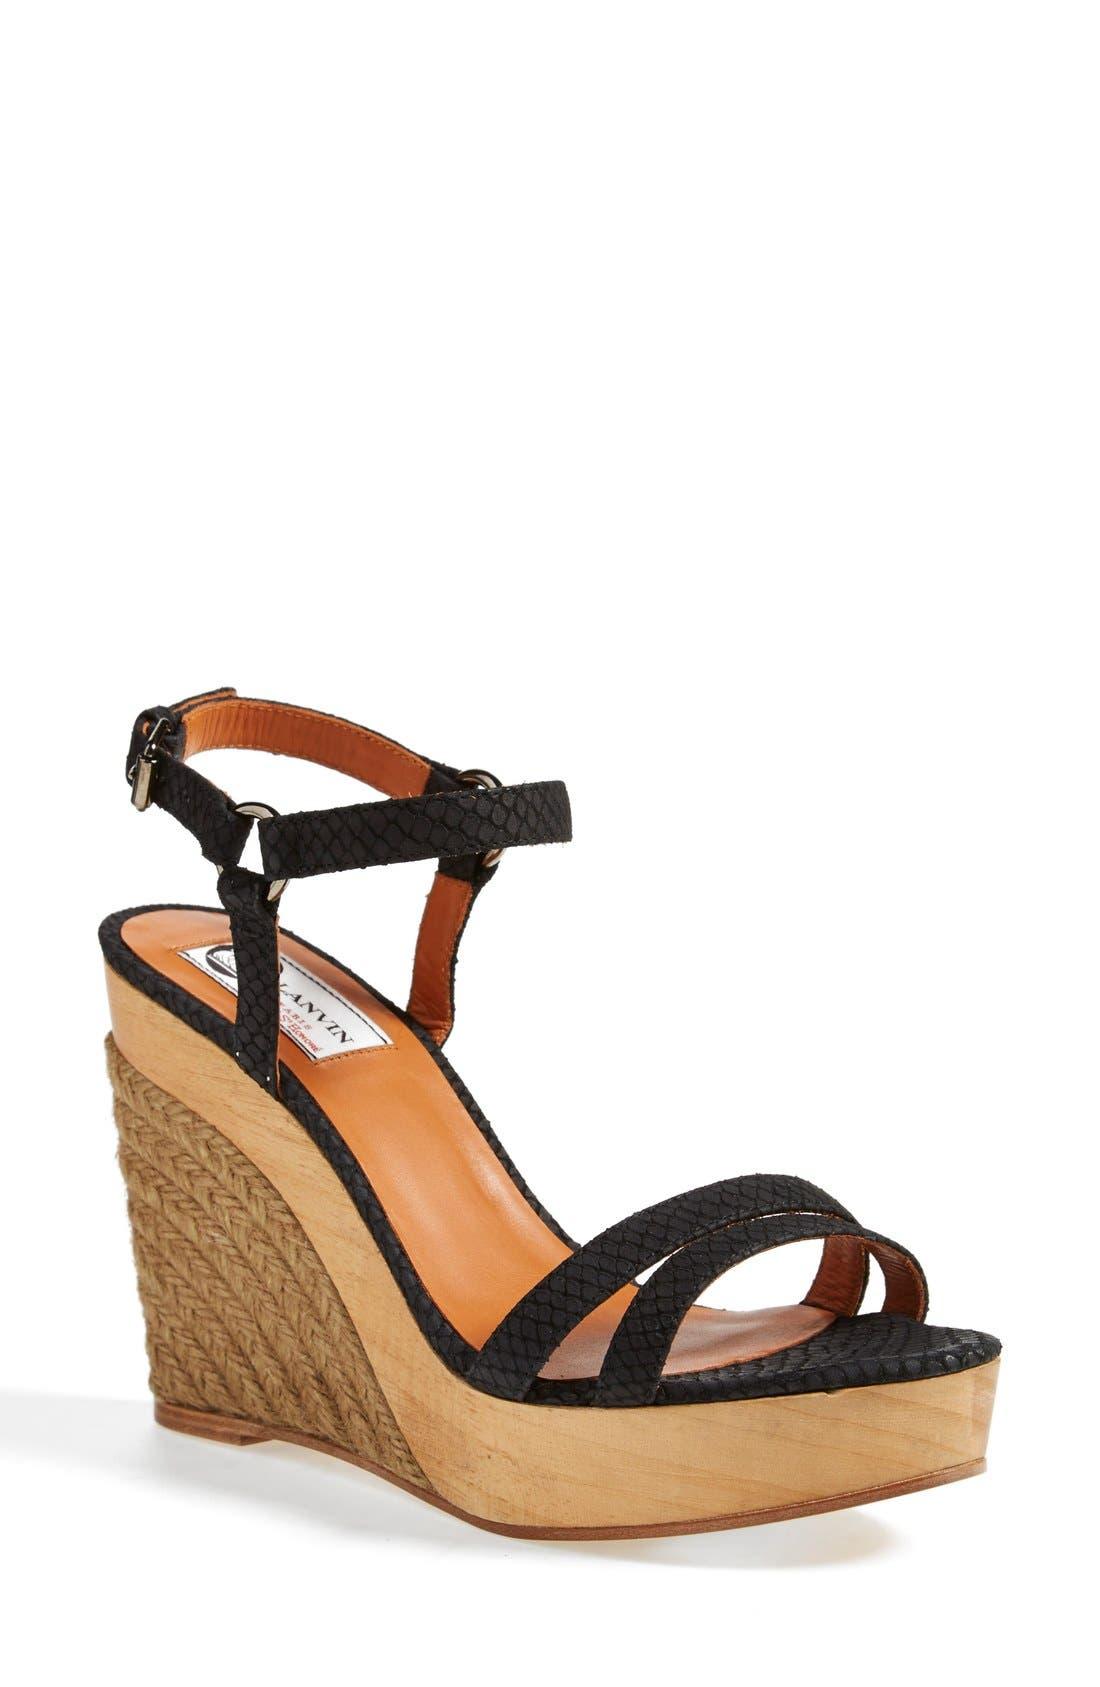 Alternate Image 1 Selected - Lanvin Espadrille Wedge Sandal (Women)